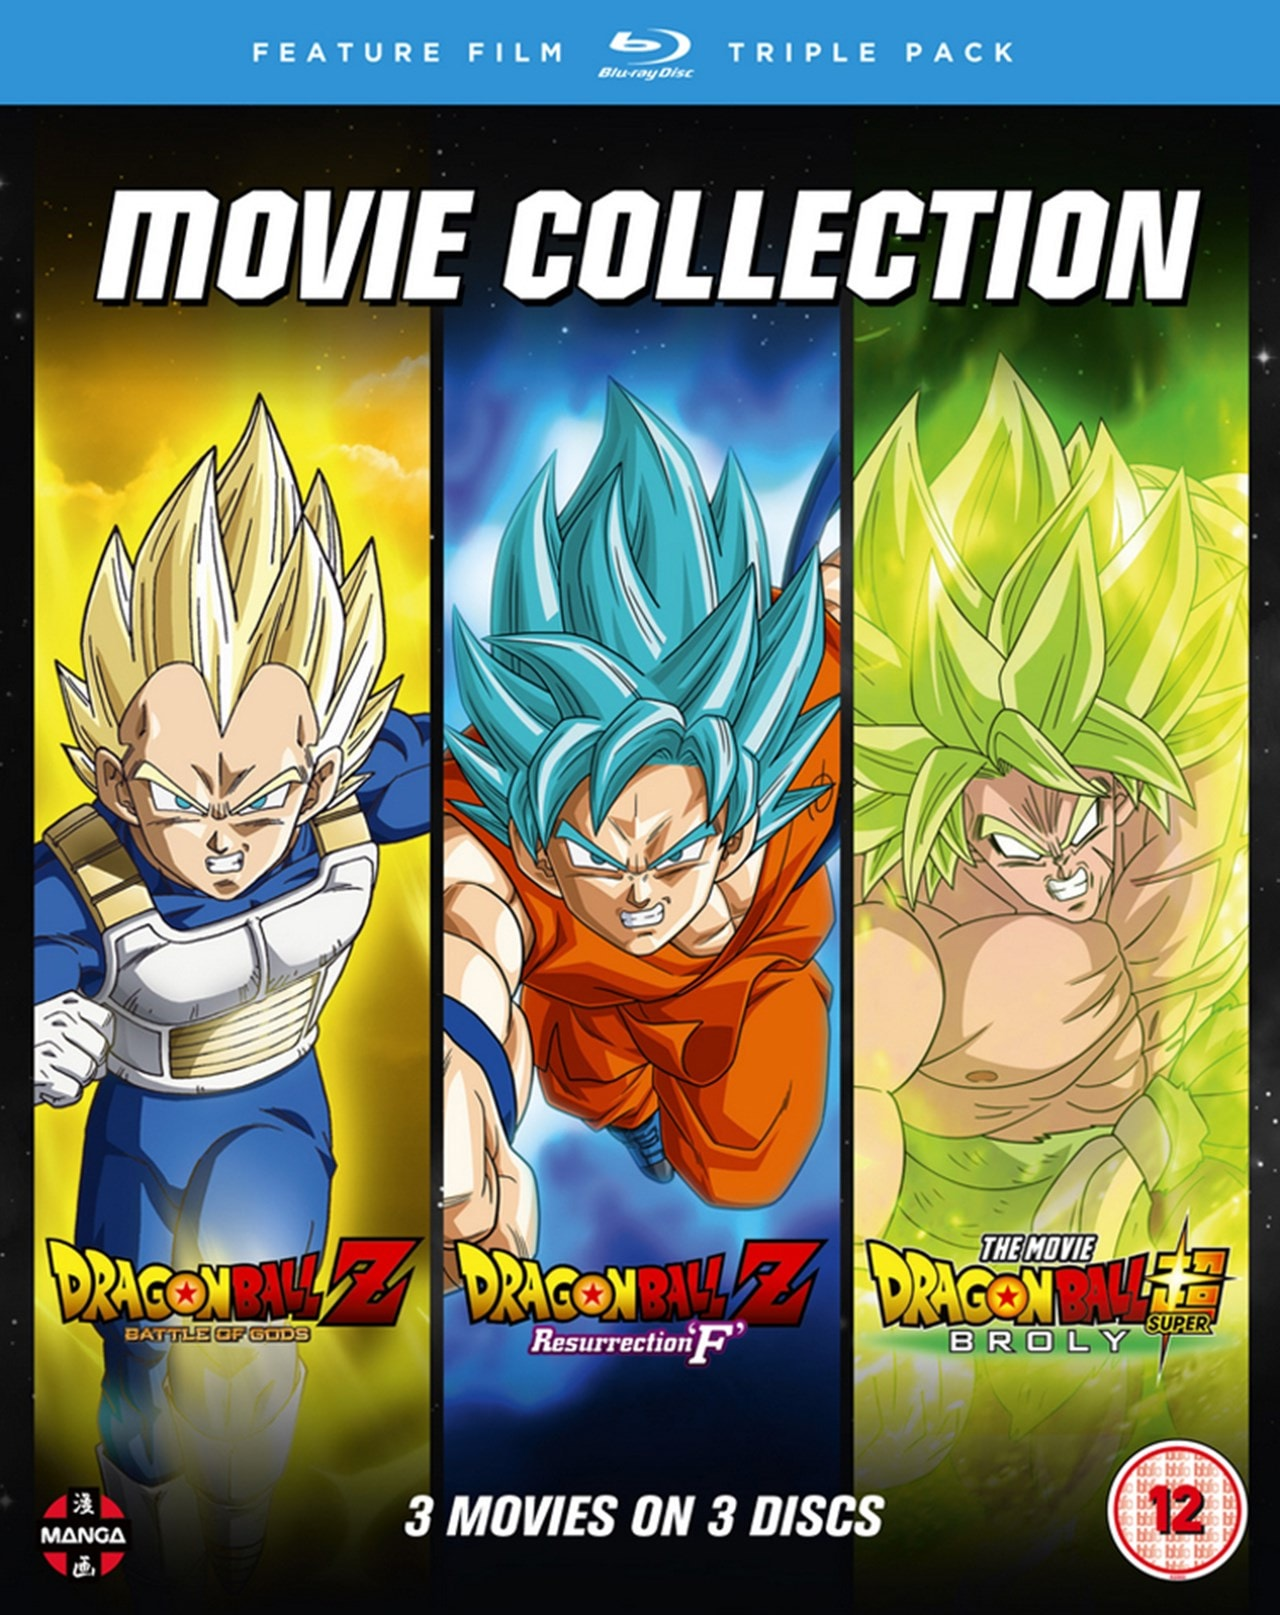 Dragon Ball Trilogy: Battle of Gods/Resurrection 'F', Broly - 1